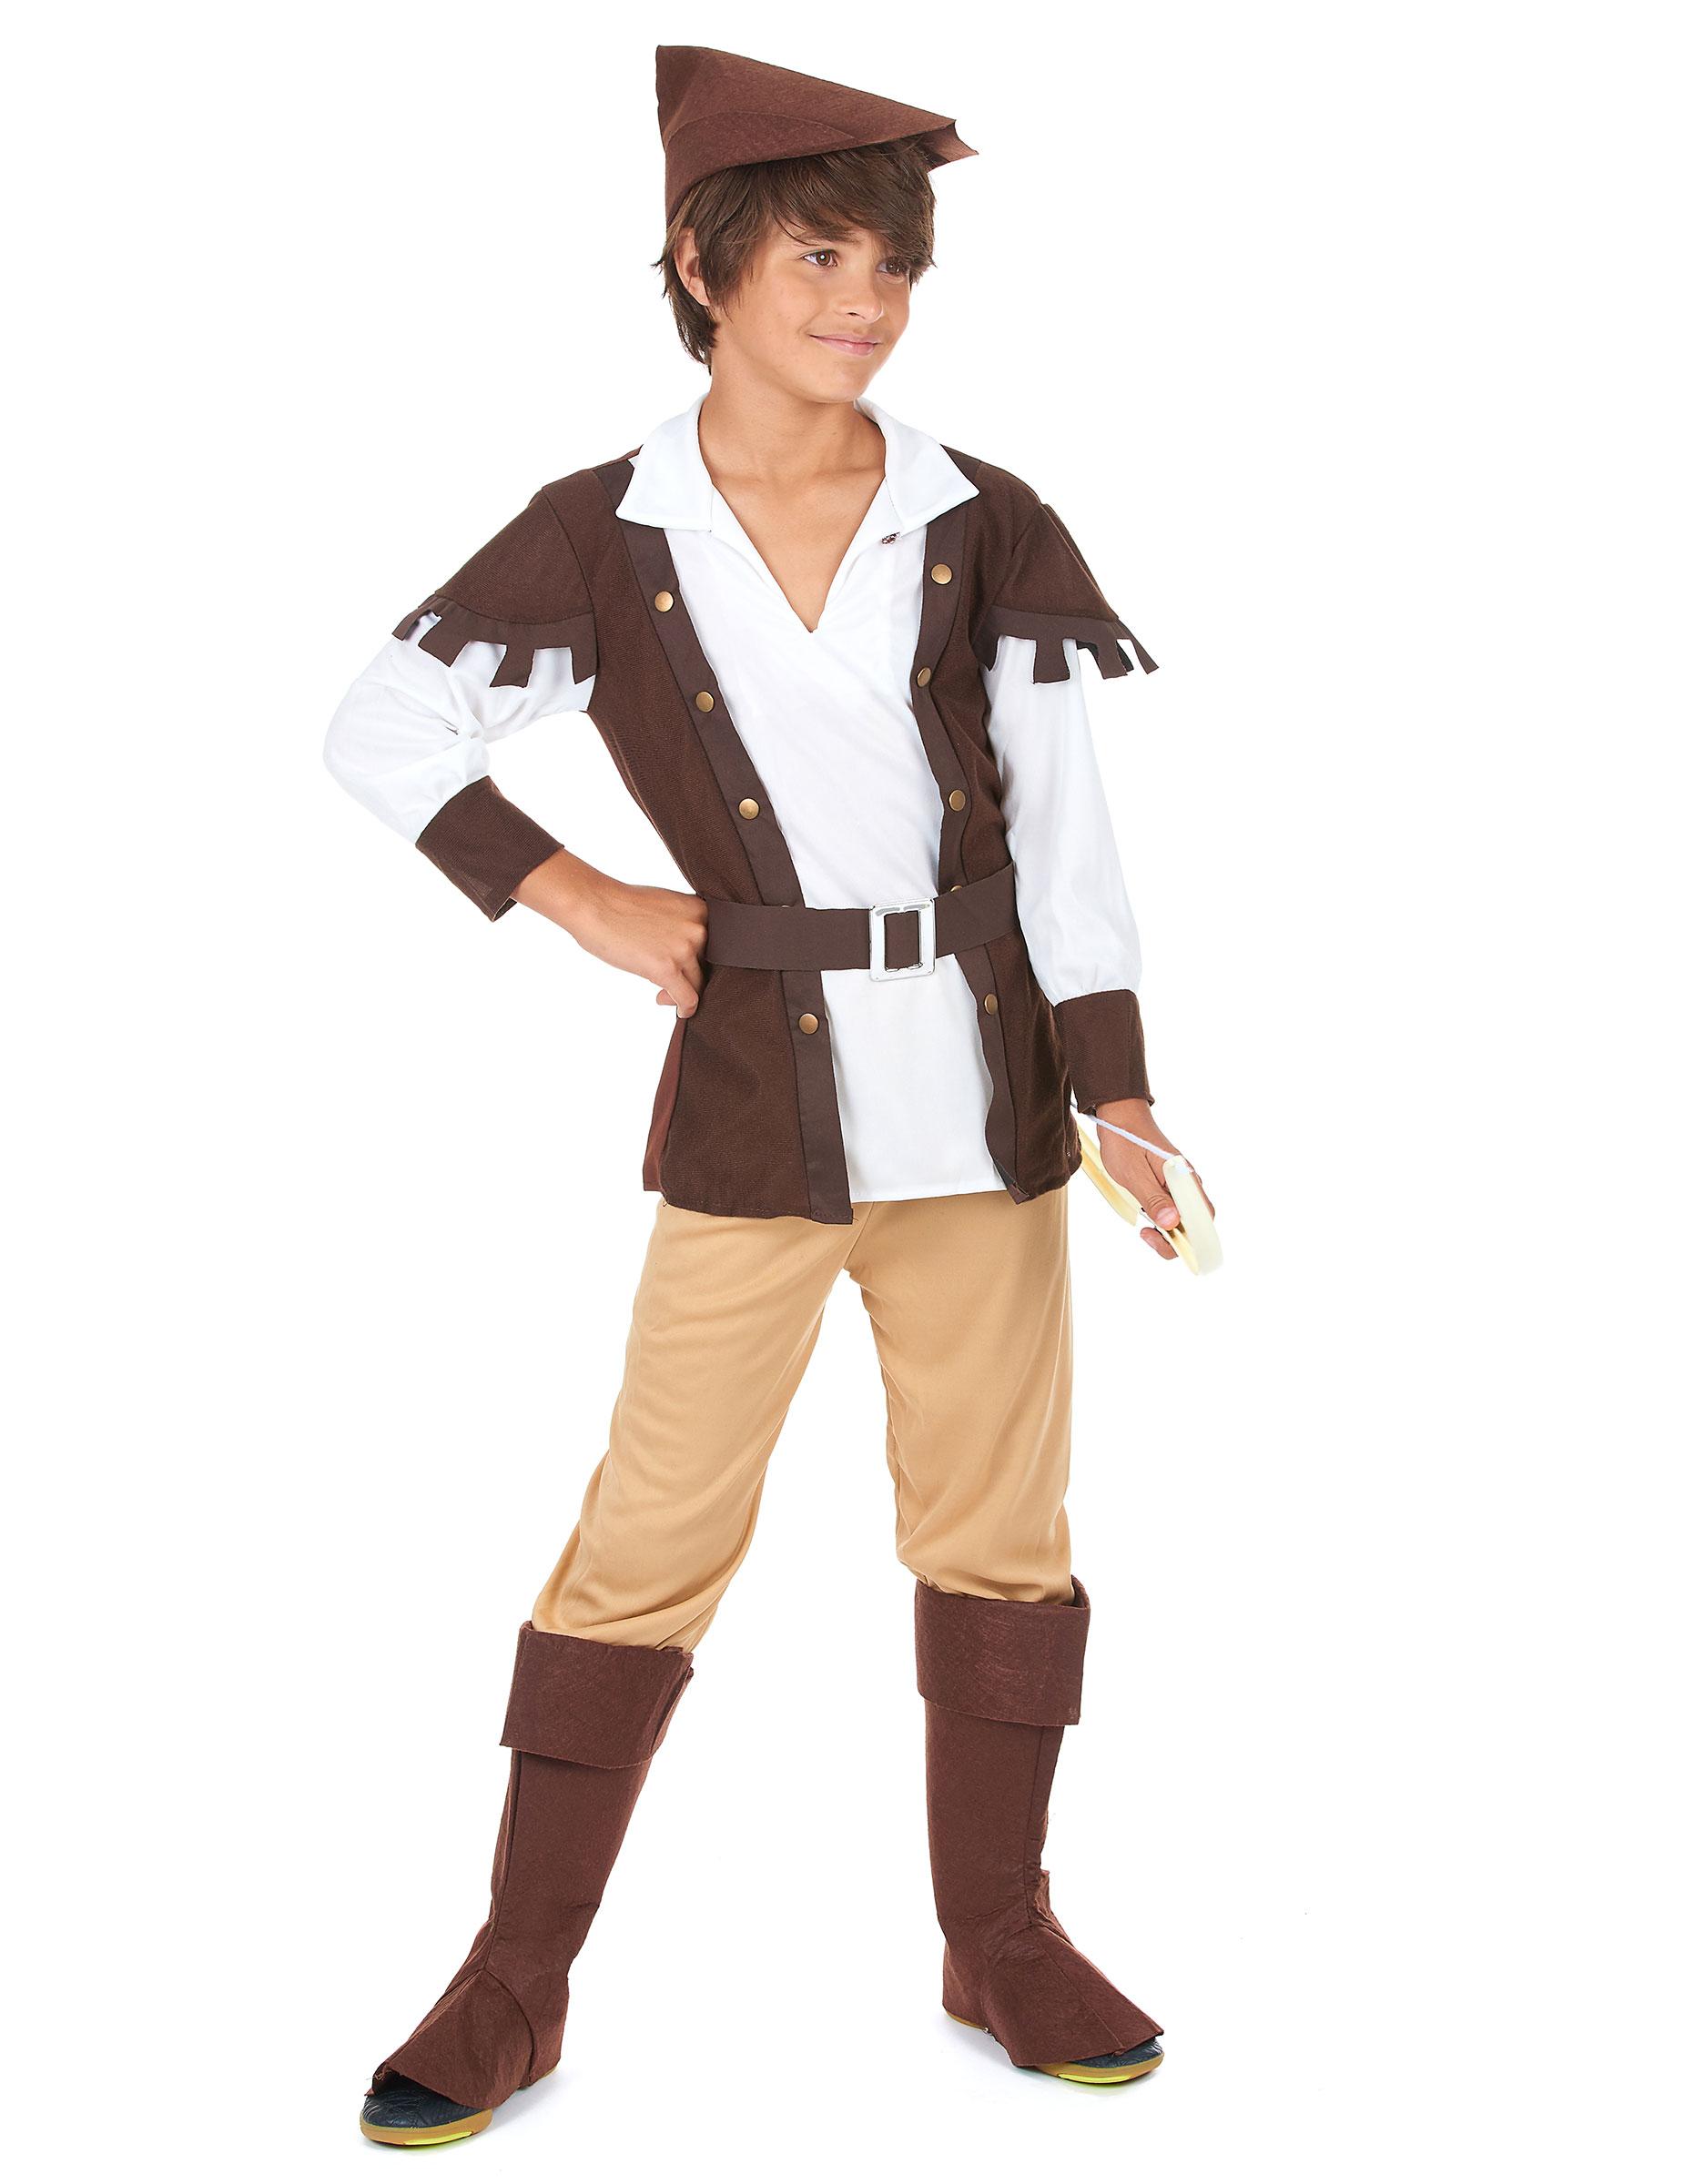 Kostume Fur Kinder Barock Renaissance Gunstige Verkleidungen Fur